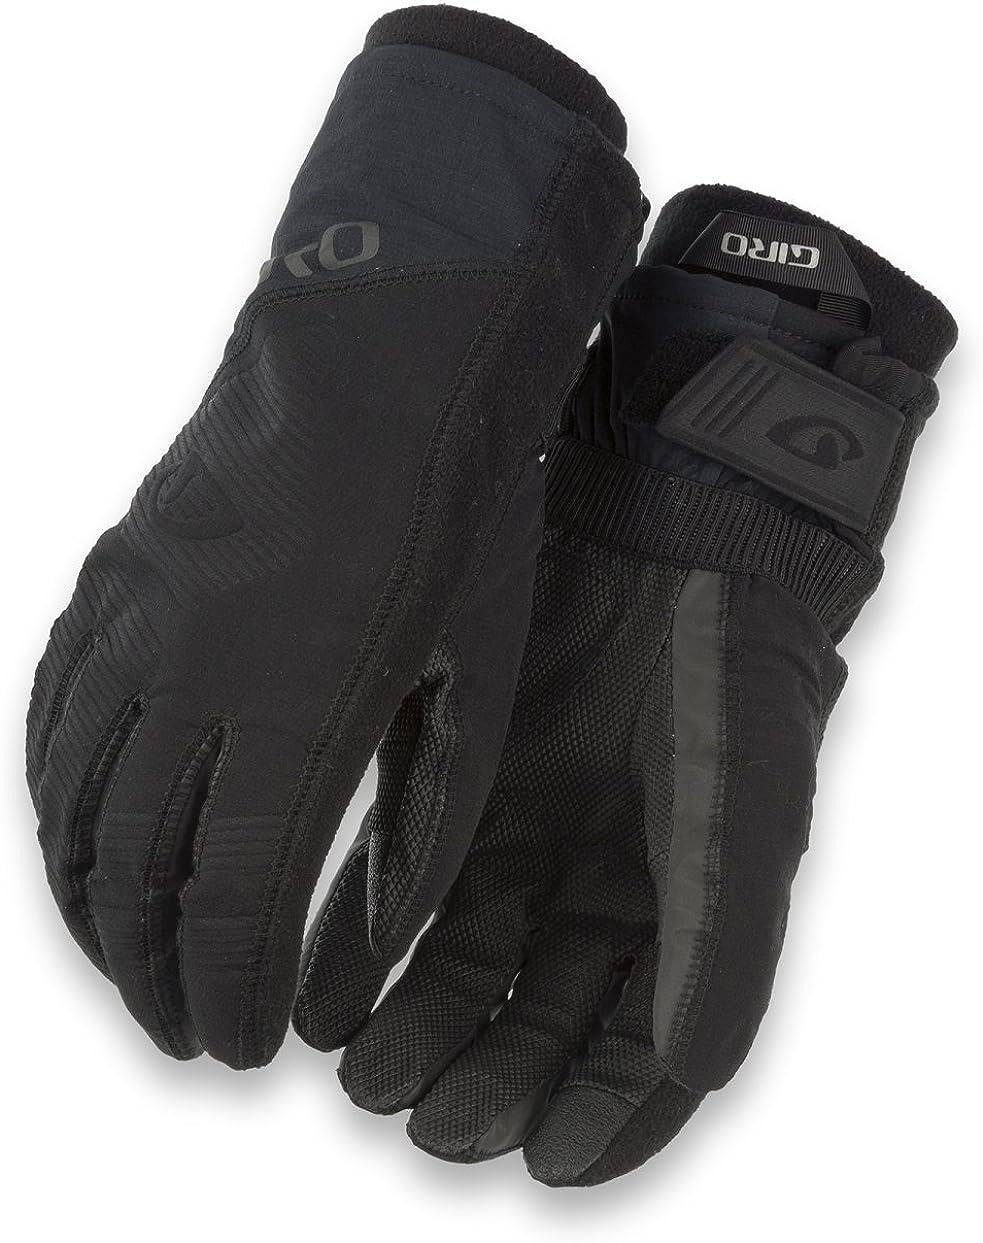 Giro Proof Adult 5% San Antonio Mall OFF Unisex Winter Cycling Black Gloves 2018 X- -